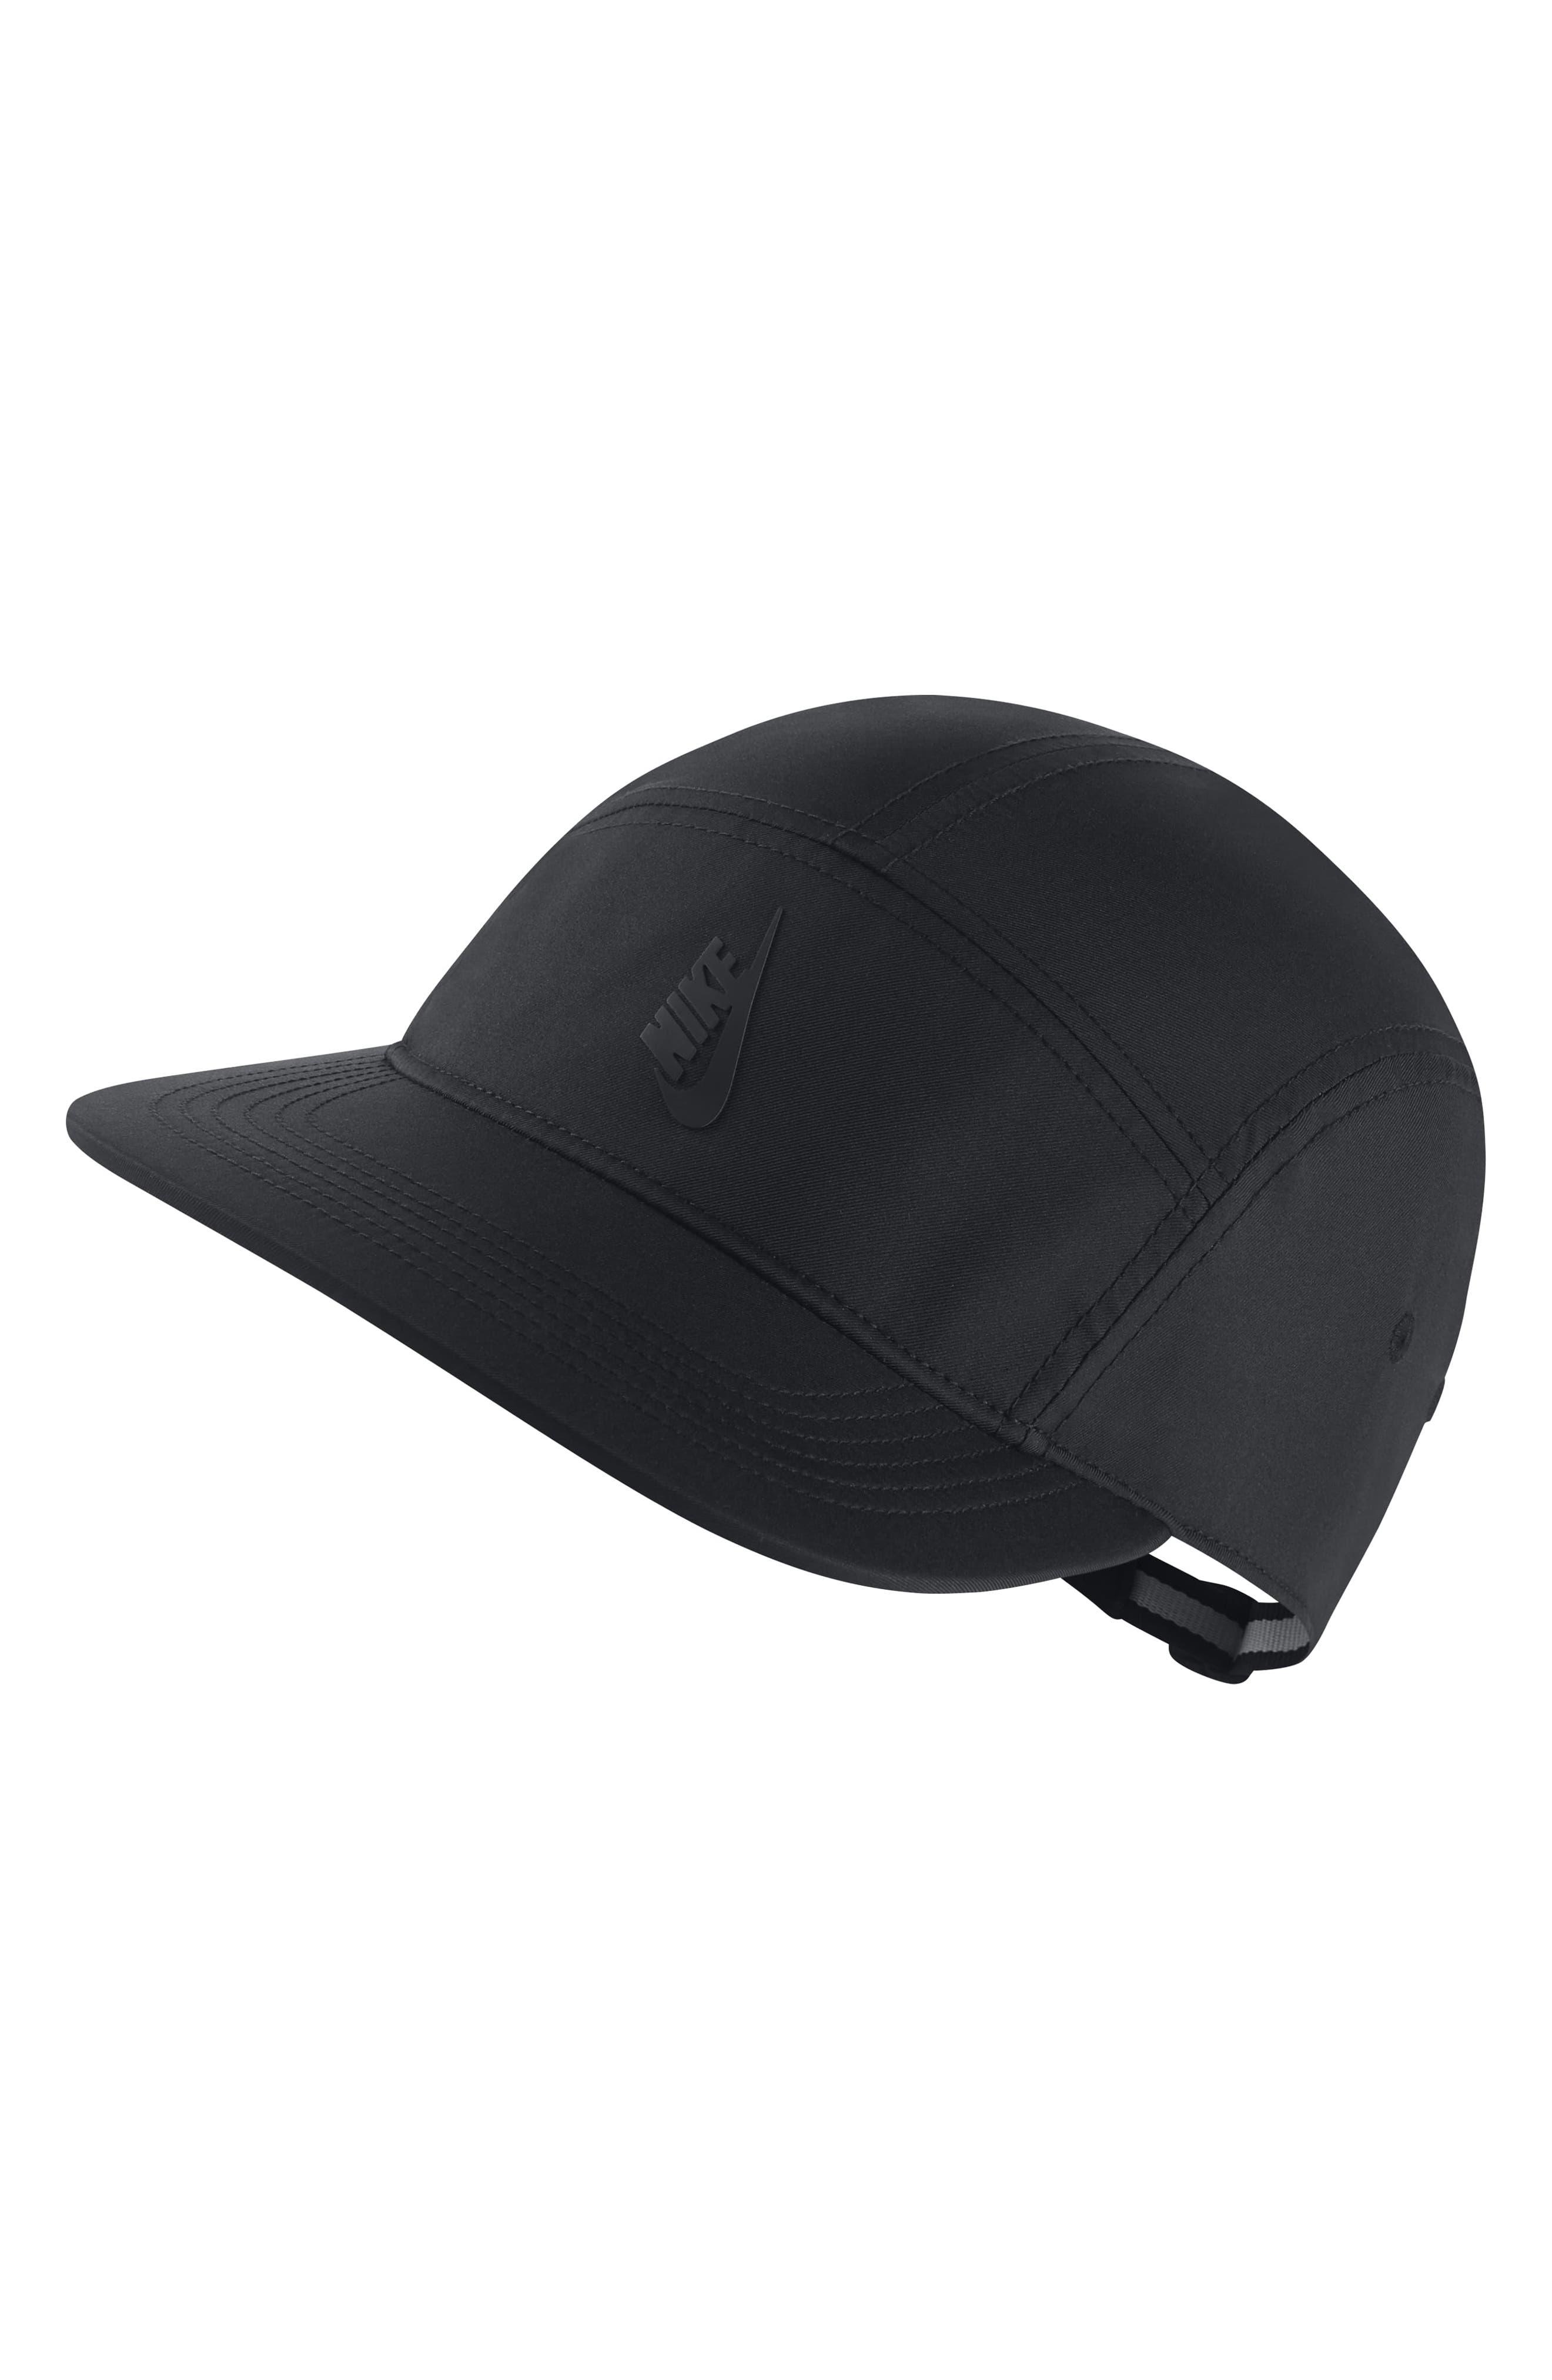 LAB BASEBALL CAP - BLACK